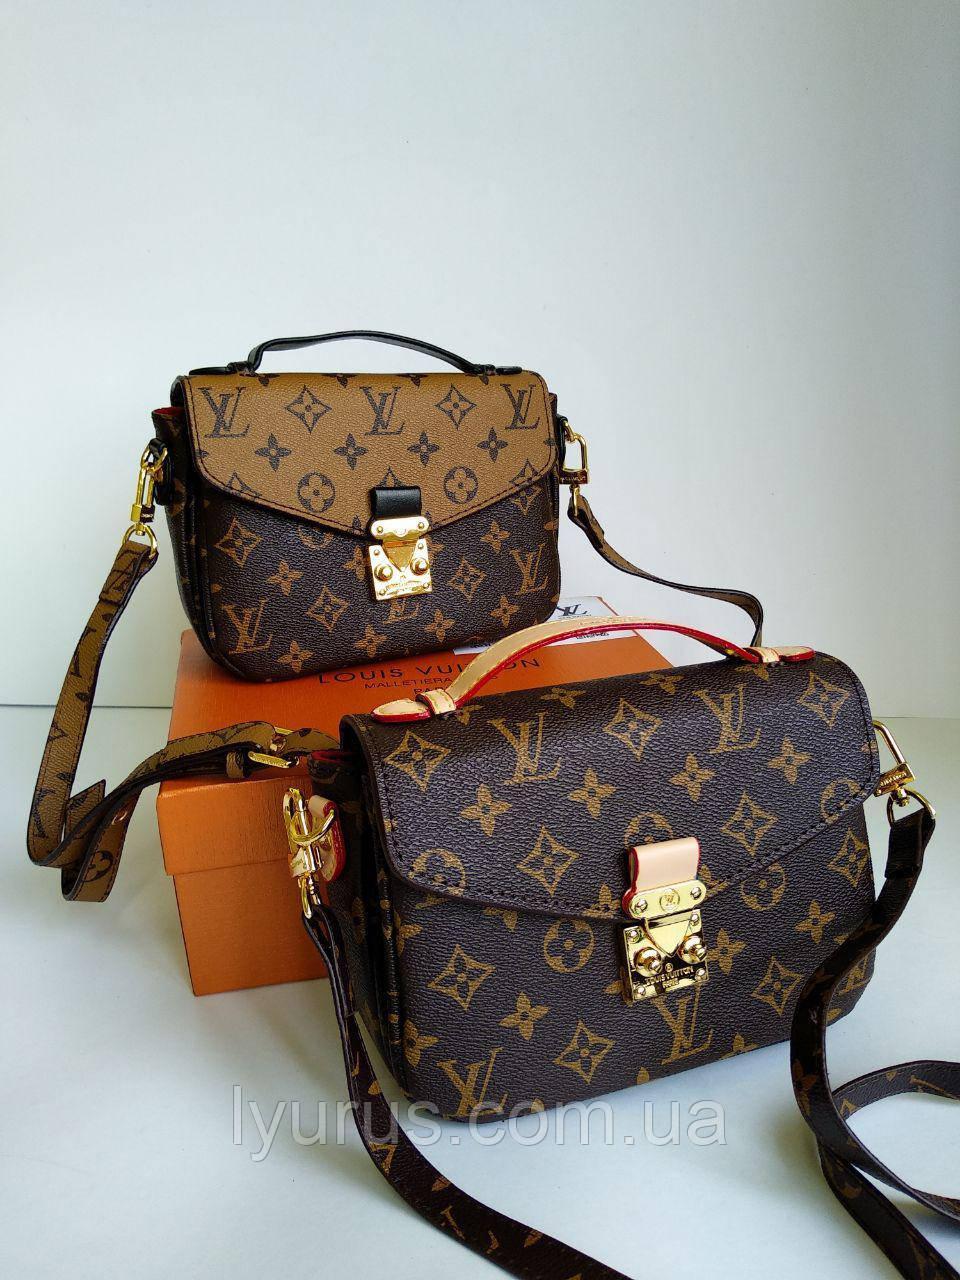 Женская сумка клатч Louis Vuitton Pochette Metis mini